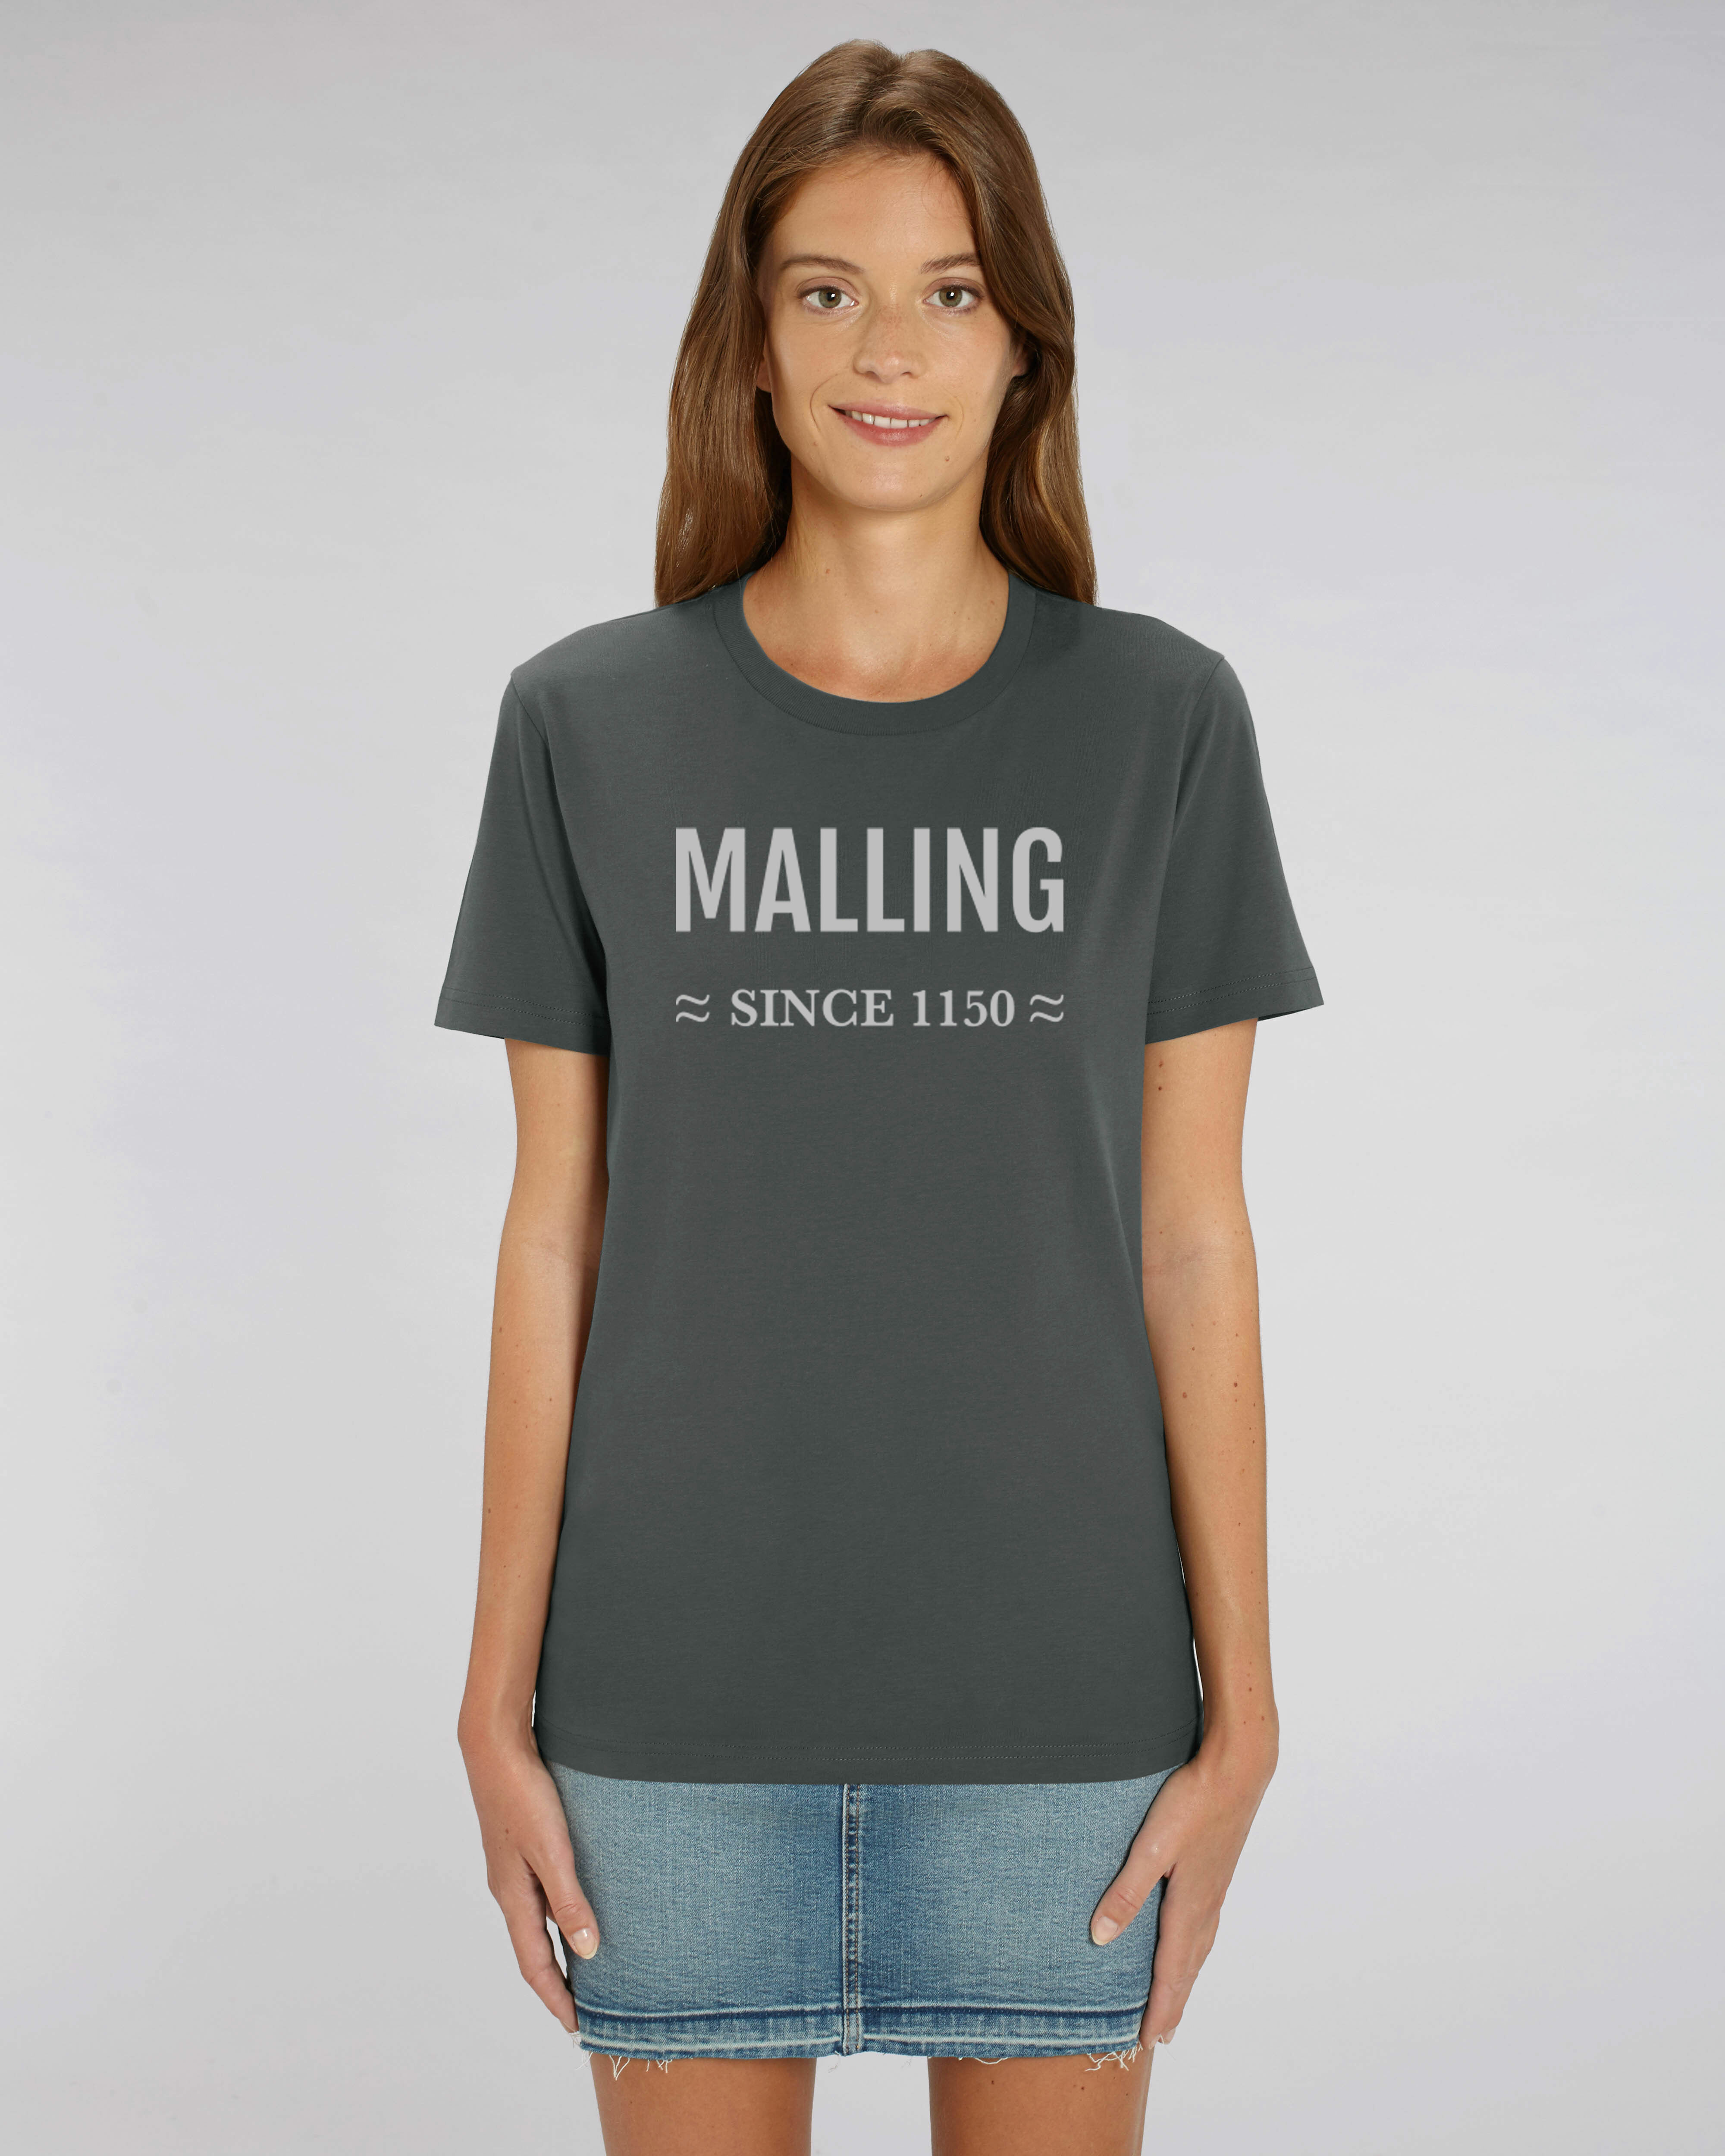 By-shirt / MALLING / VOKSEN / unisex